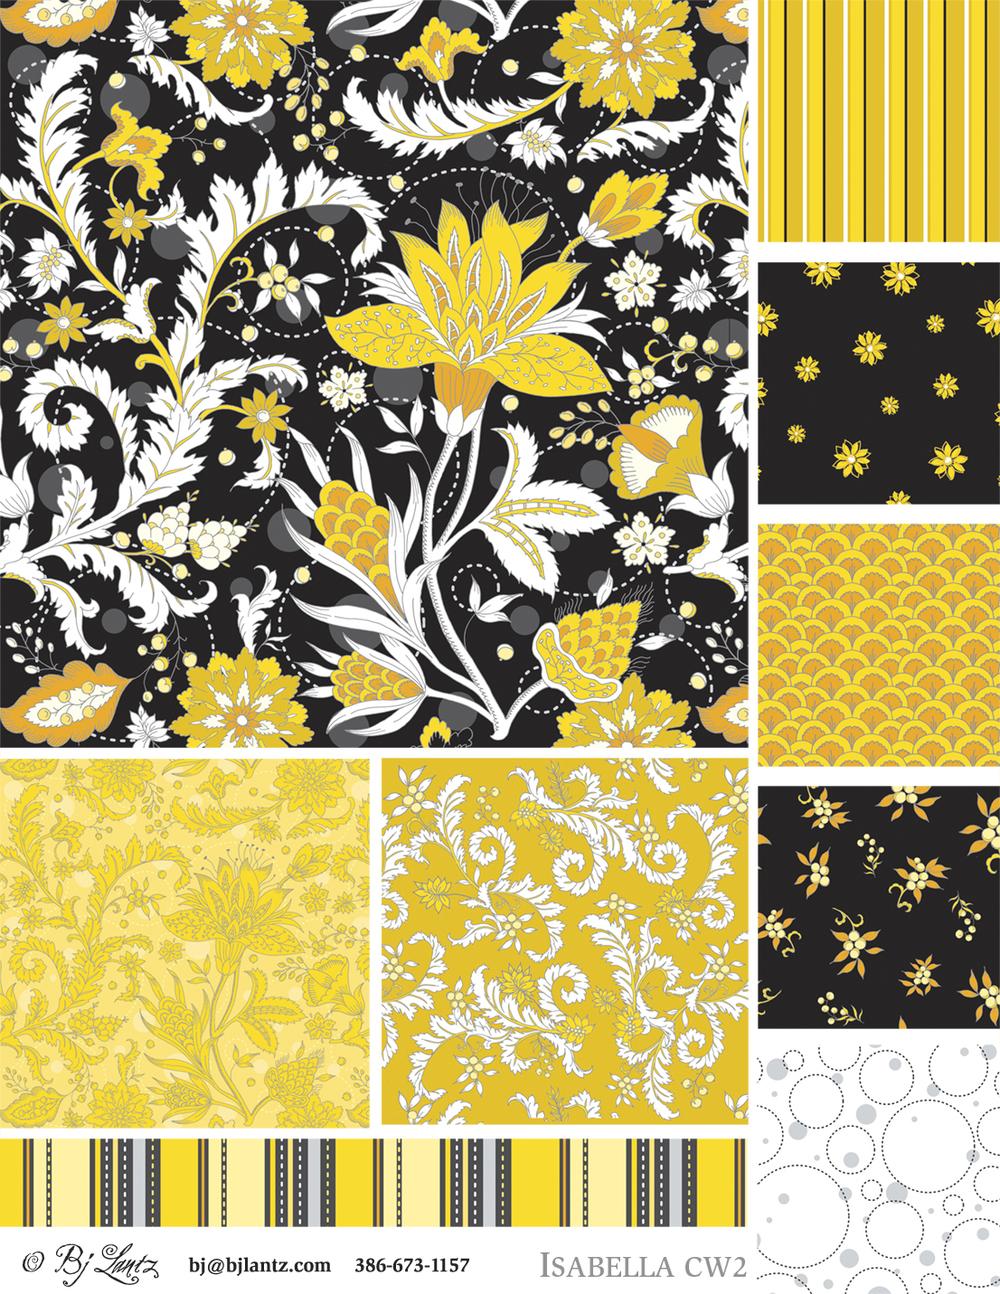 Patterns_016.jpg